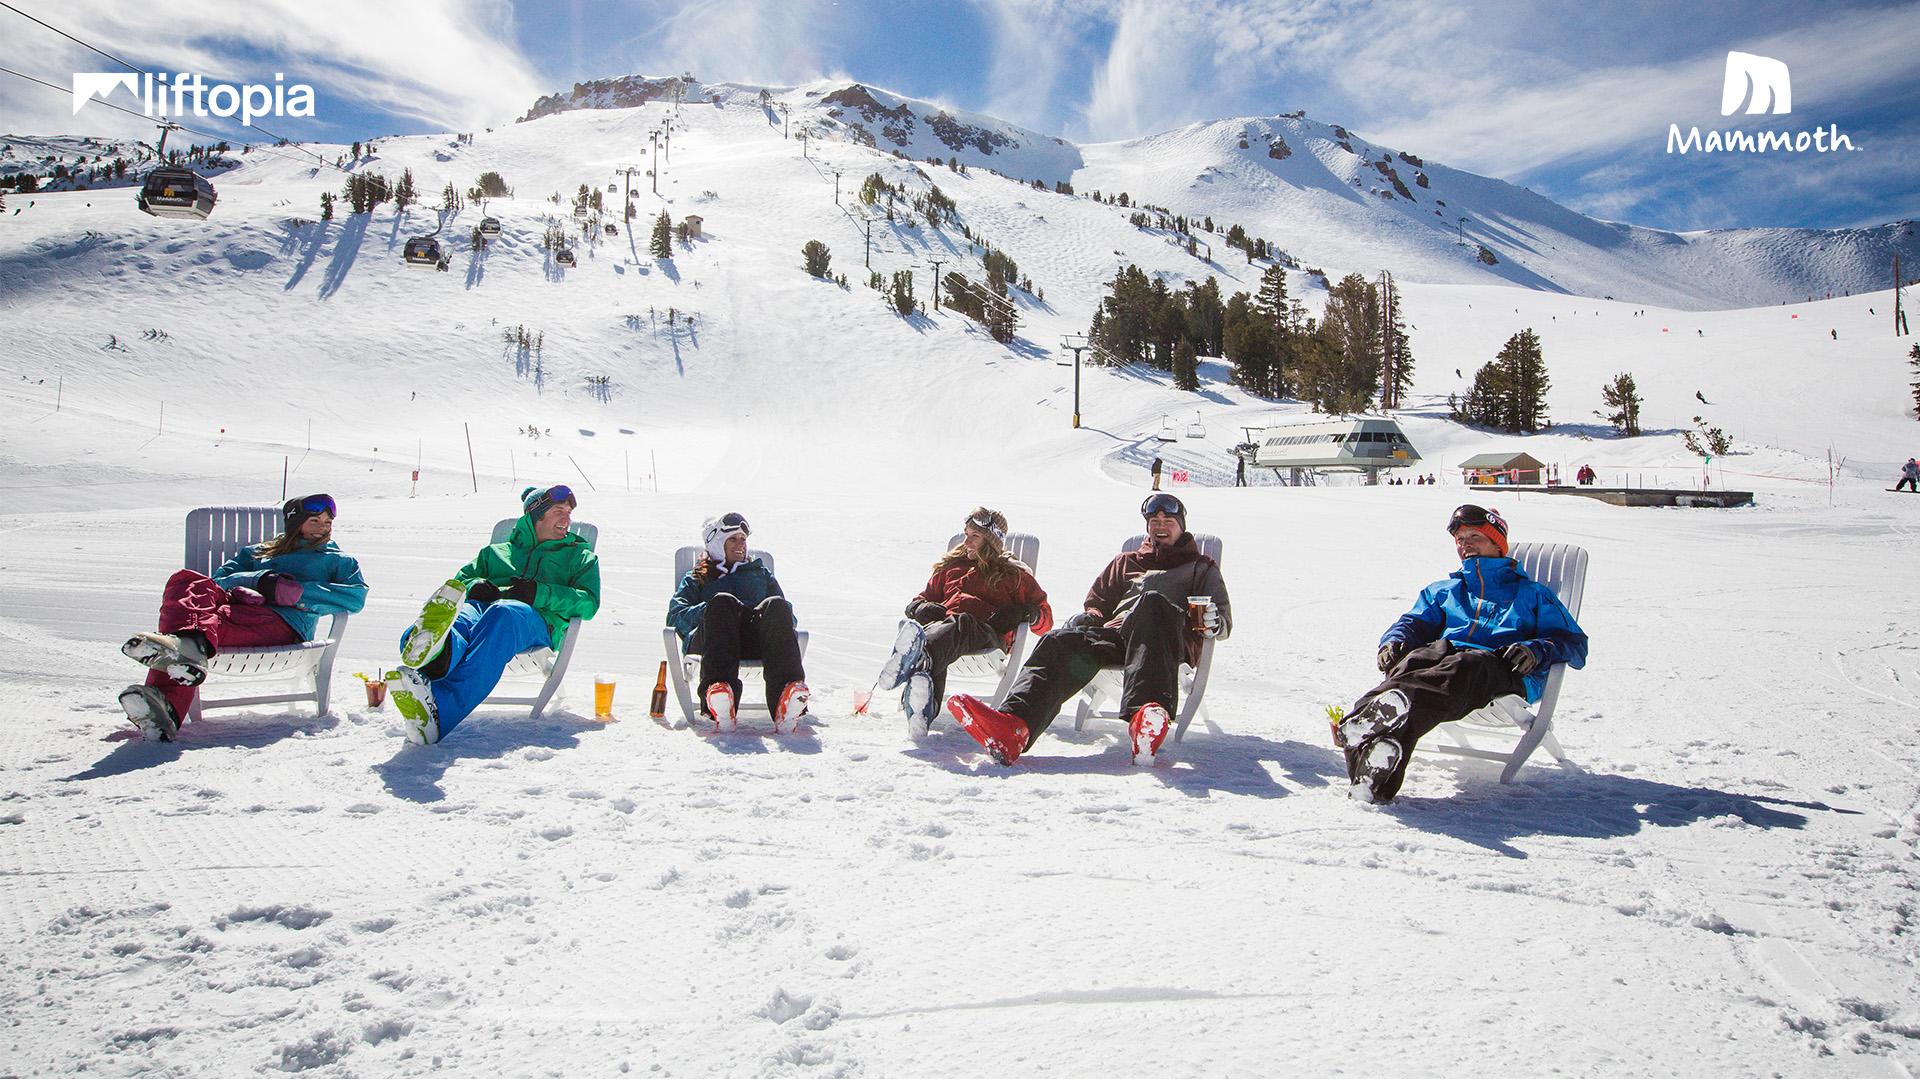 8 Ski Themed Zoom Virtual Backgrounds Liftopia Blog 1920x1080